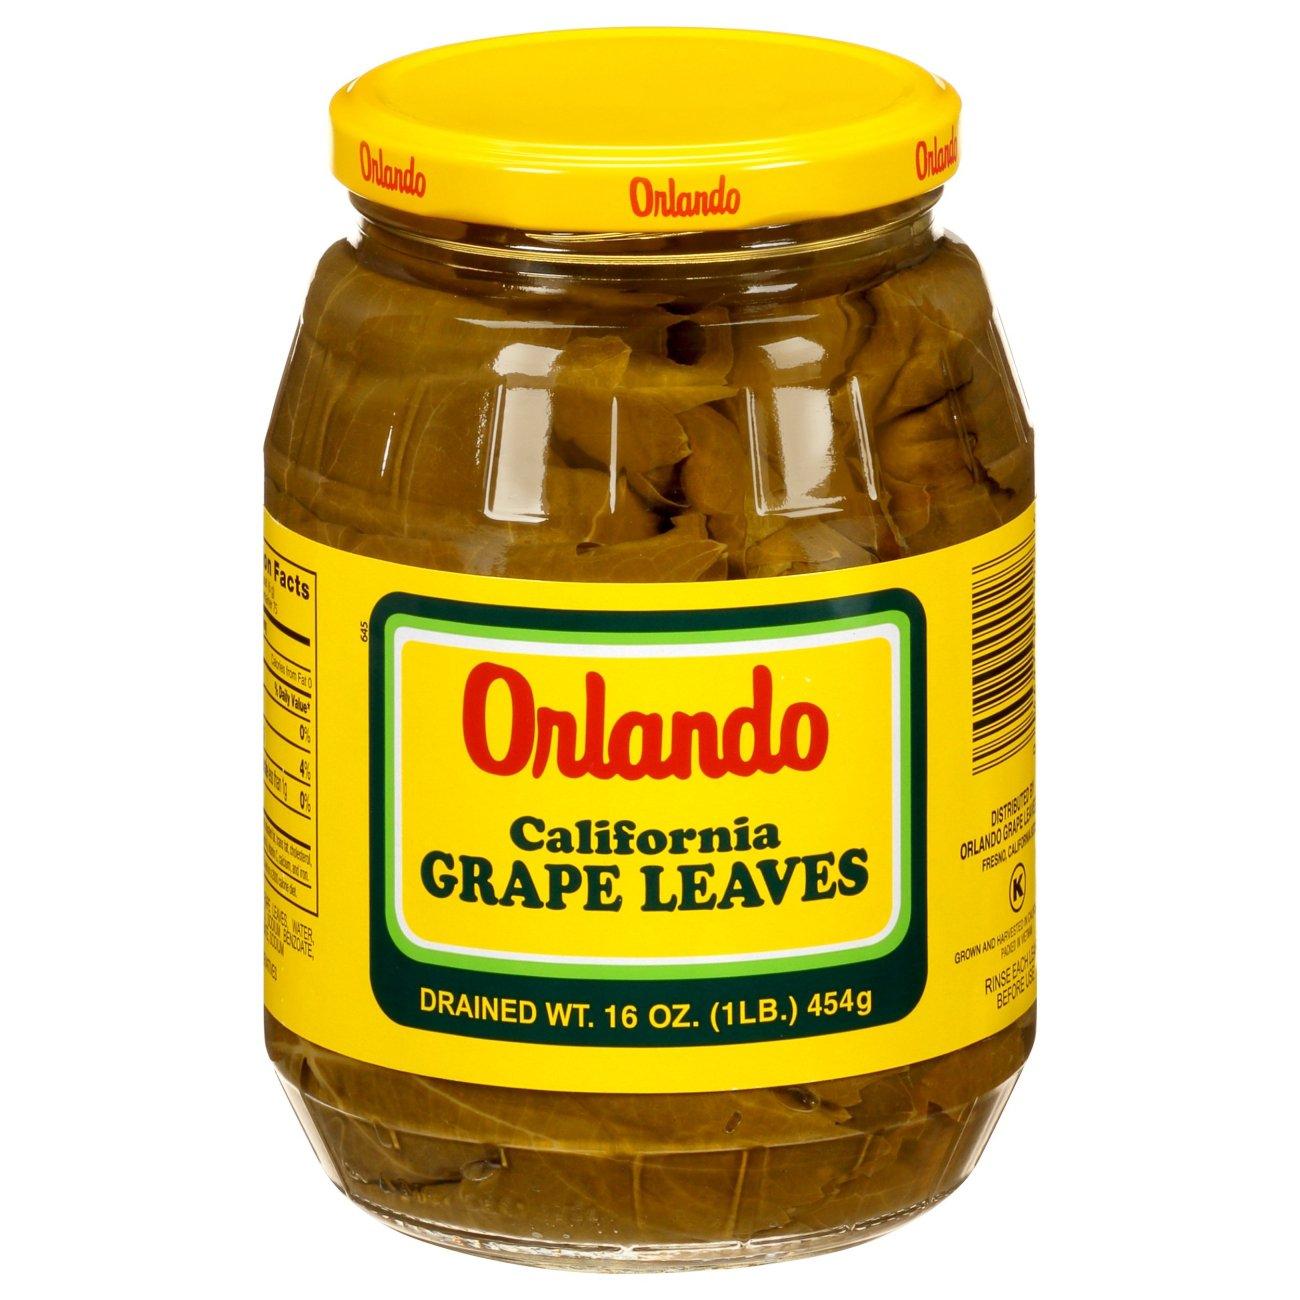 Orlando California Grape Leaves Shop Pantry Meals At H E B